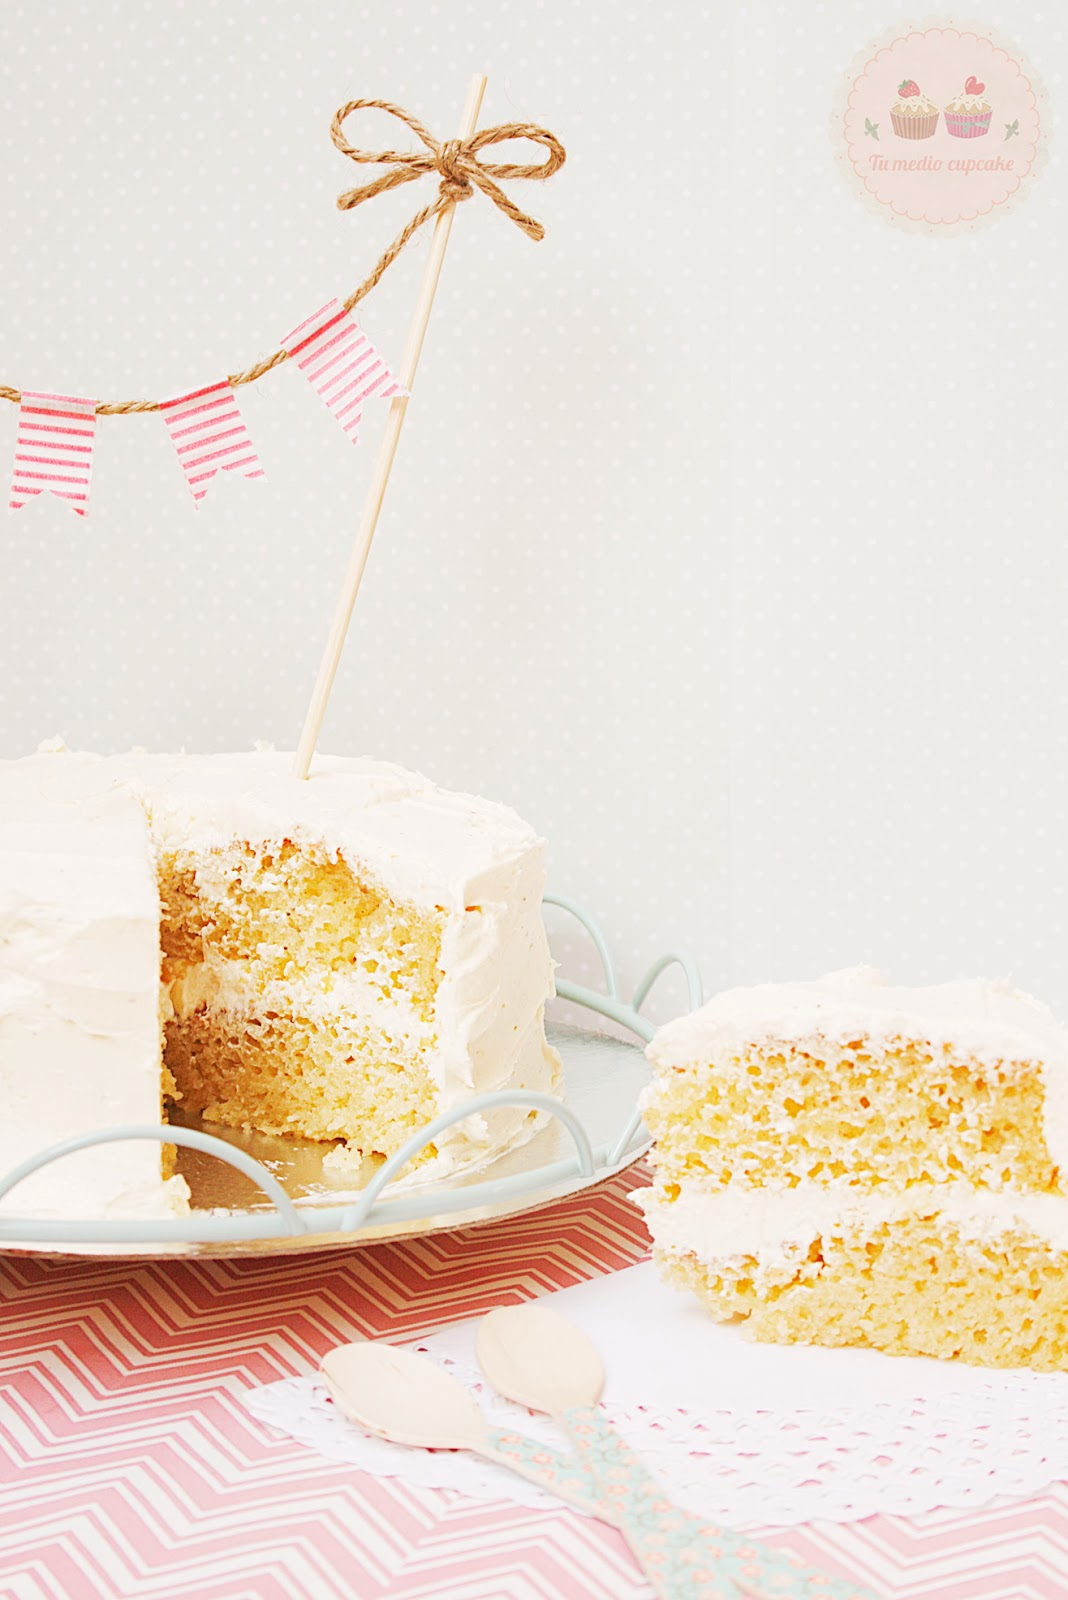 http://www.tumediocupcake.blogspot.com.es/2013/11/layer-cake-bizcocho-crema-de-orujo.html